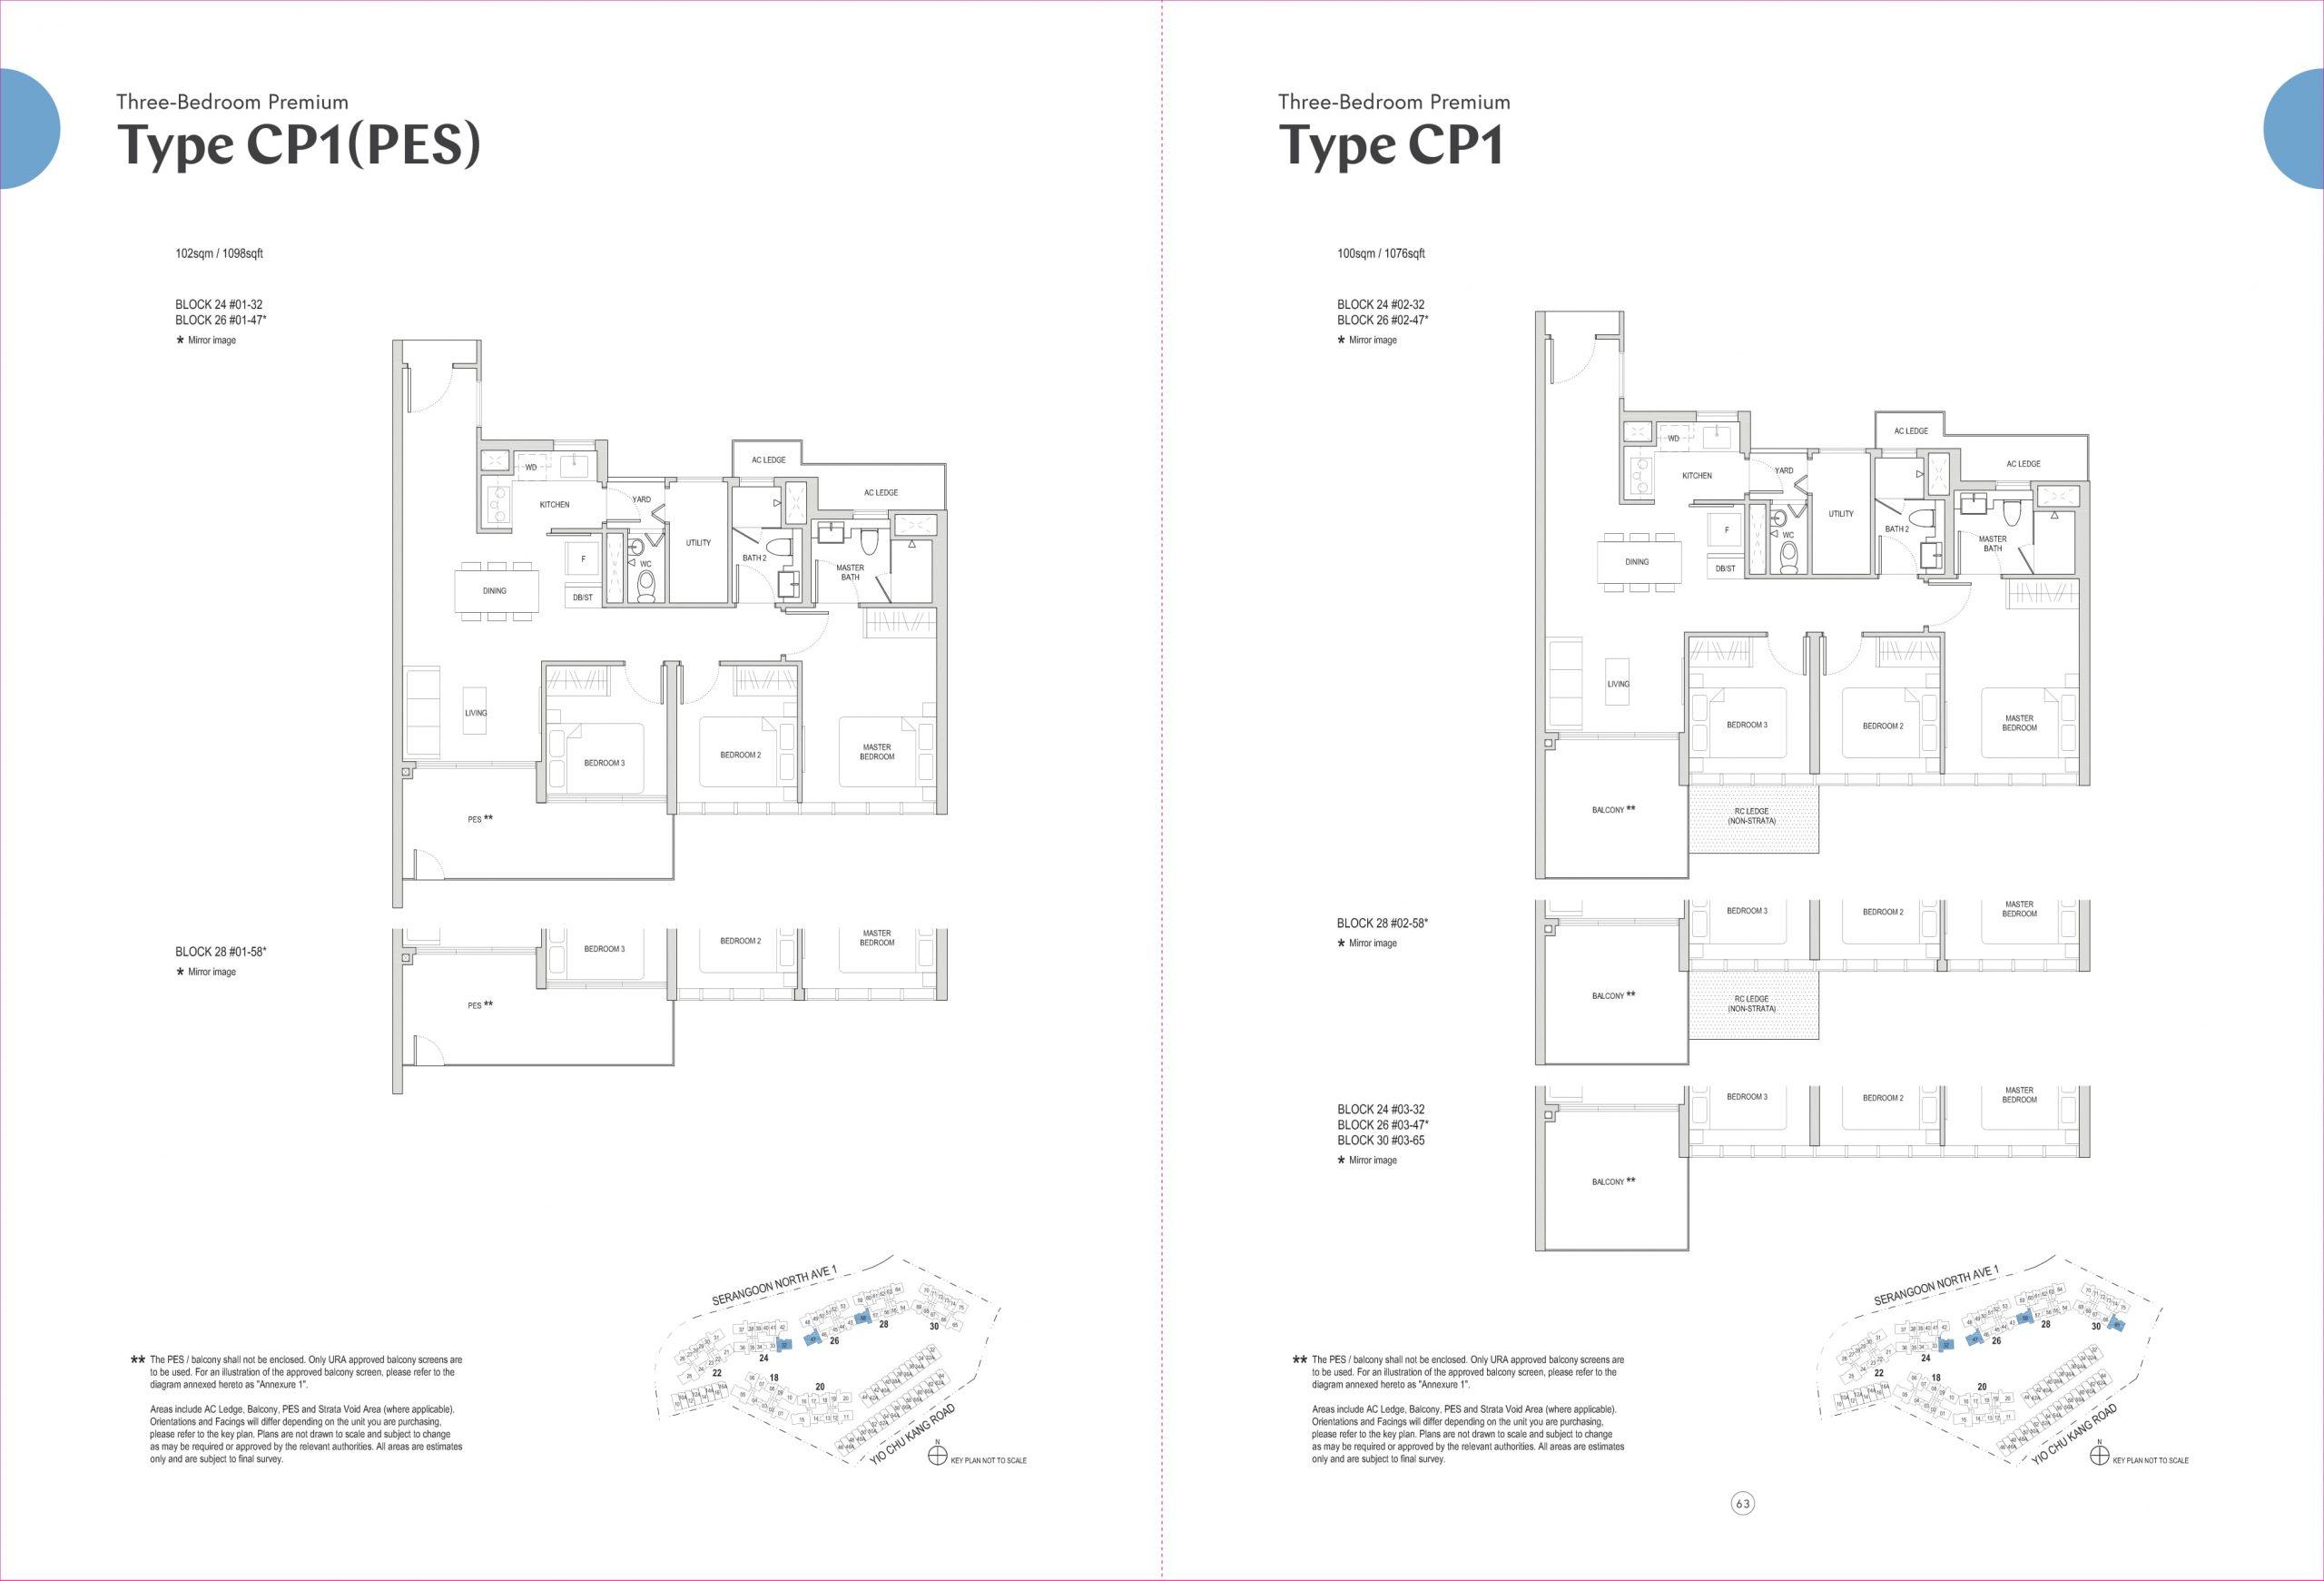 Affinity at Serangoon's three-bedroom premium and three-bedroom deluxe types